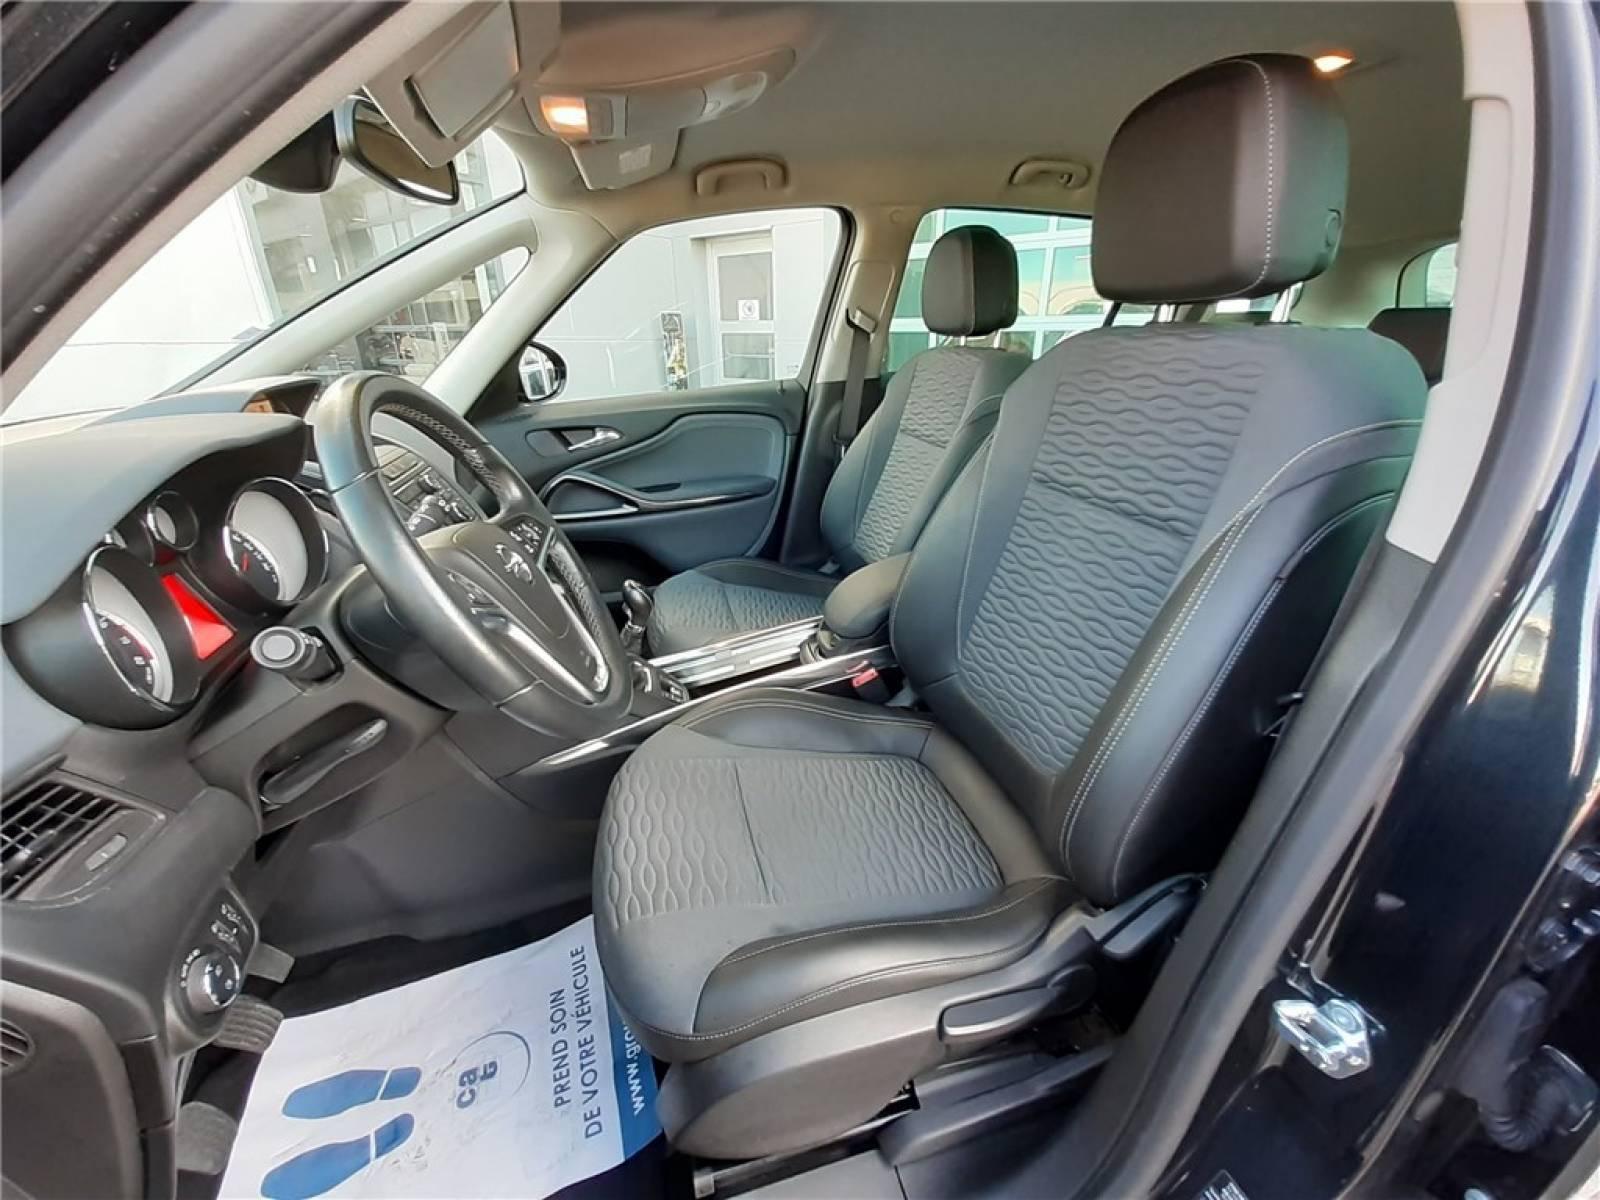 OPEL Zafira Tourer 1.4 Turbo 140 ch Start/Stop EcoFlex - véhicule d'occasion - Groupe Guillet - Opel Magicauto - Chalon-sur-Saône - 71380 - Saint-Marcel - 21